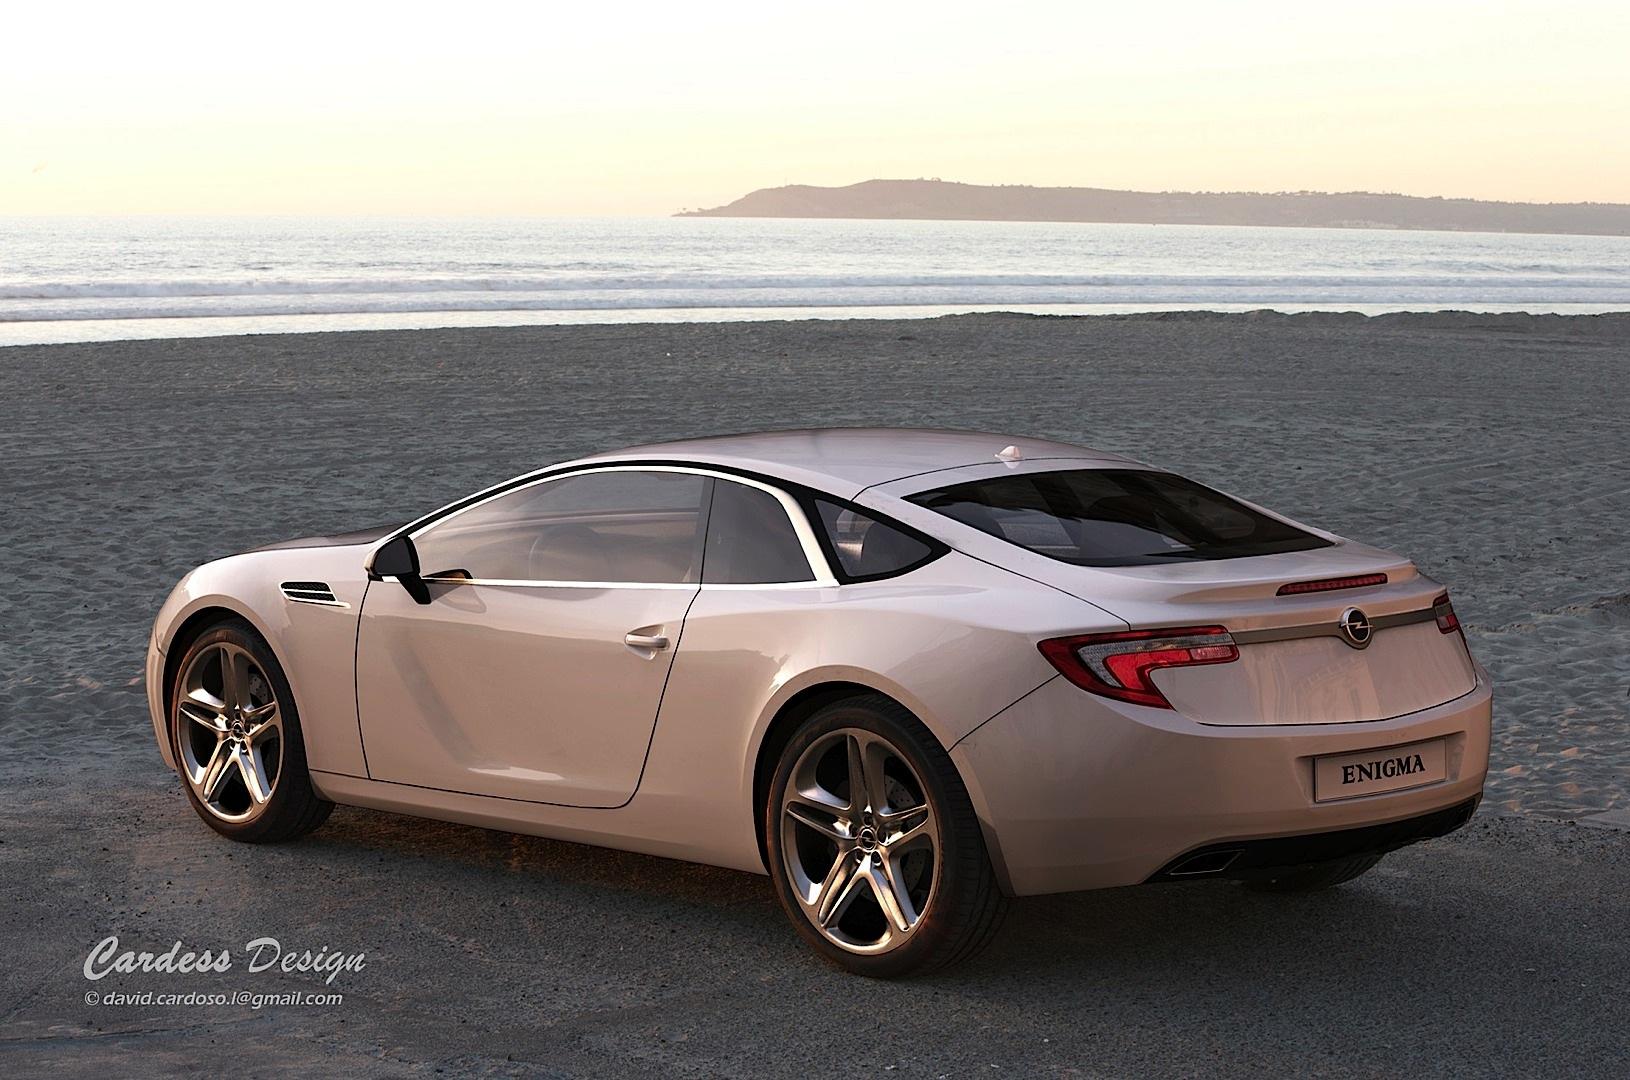 Awd Sports Cars >> Rendering: Opel Enigma Is the Calibra Reborn - autoevolution